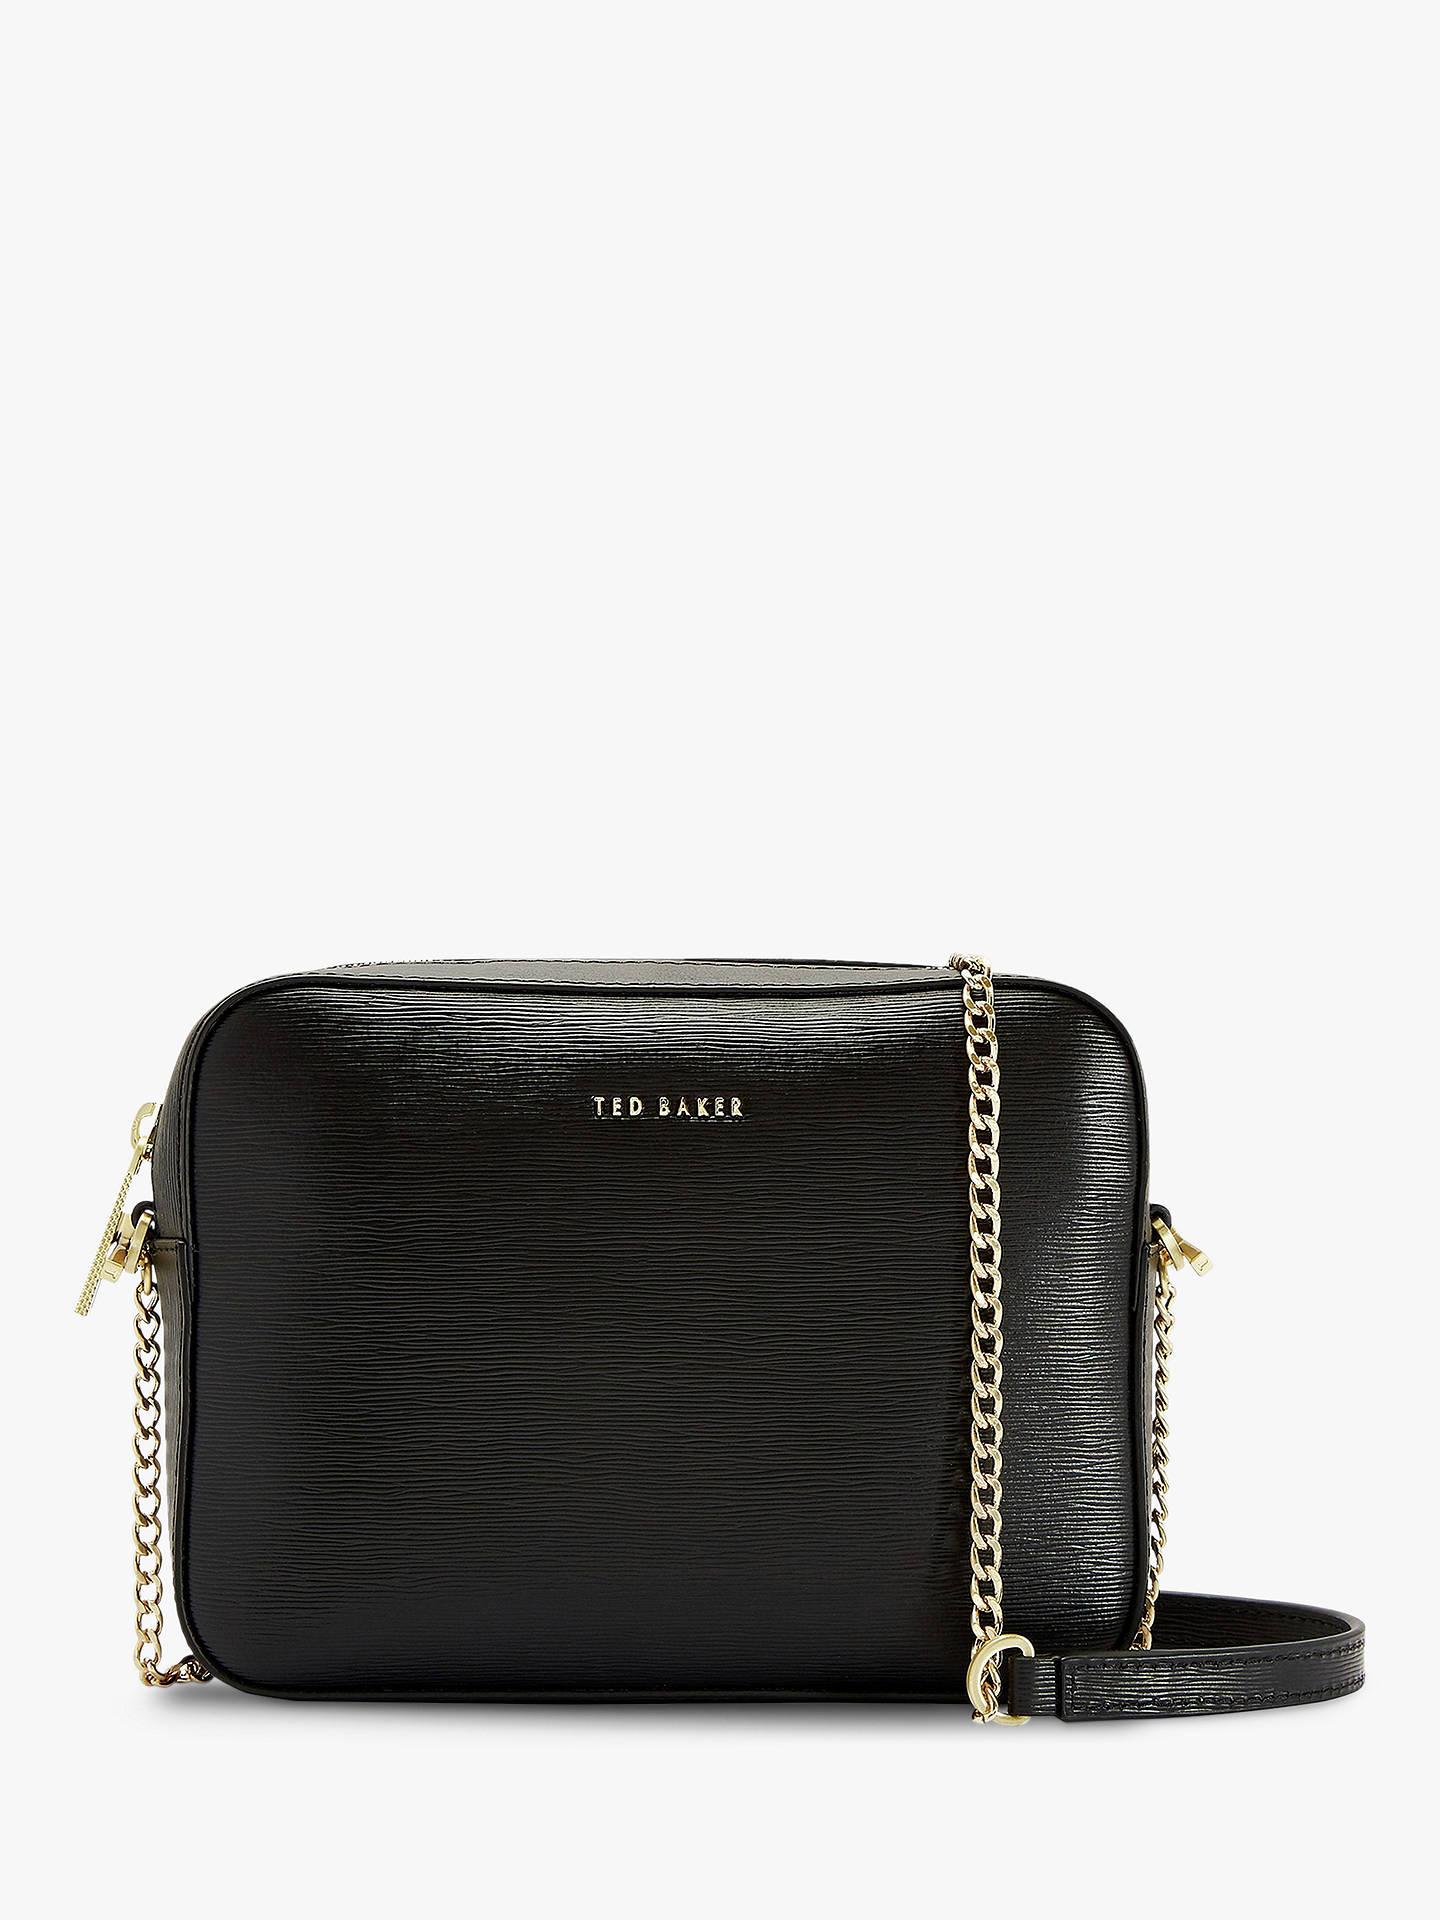 5d556572d Ted Baker Juliie Leather Camera Bag at John Lewis   Partners